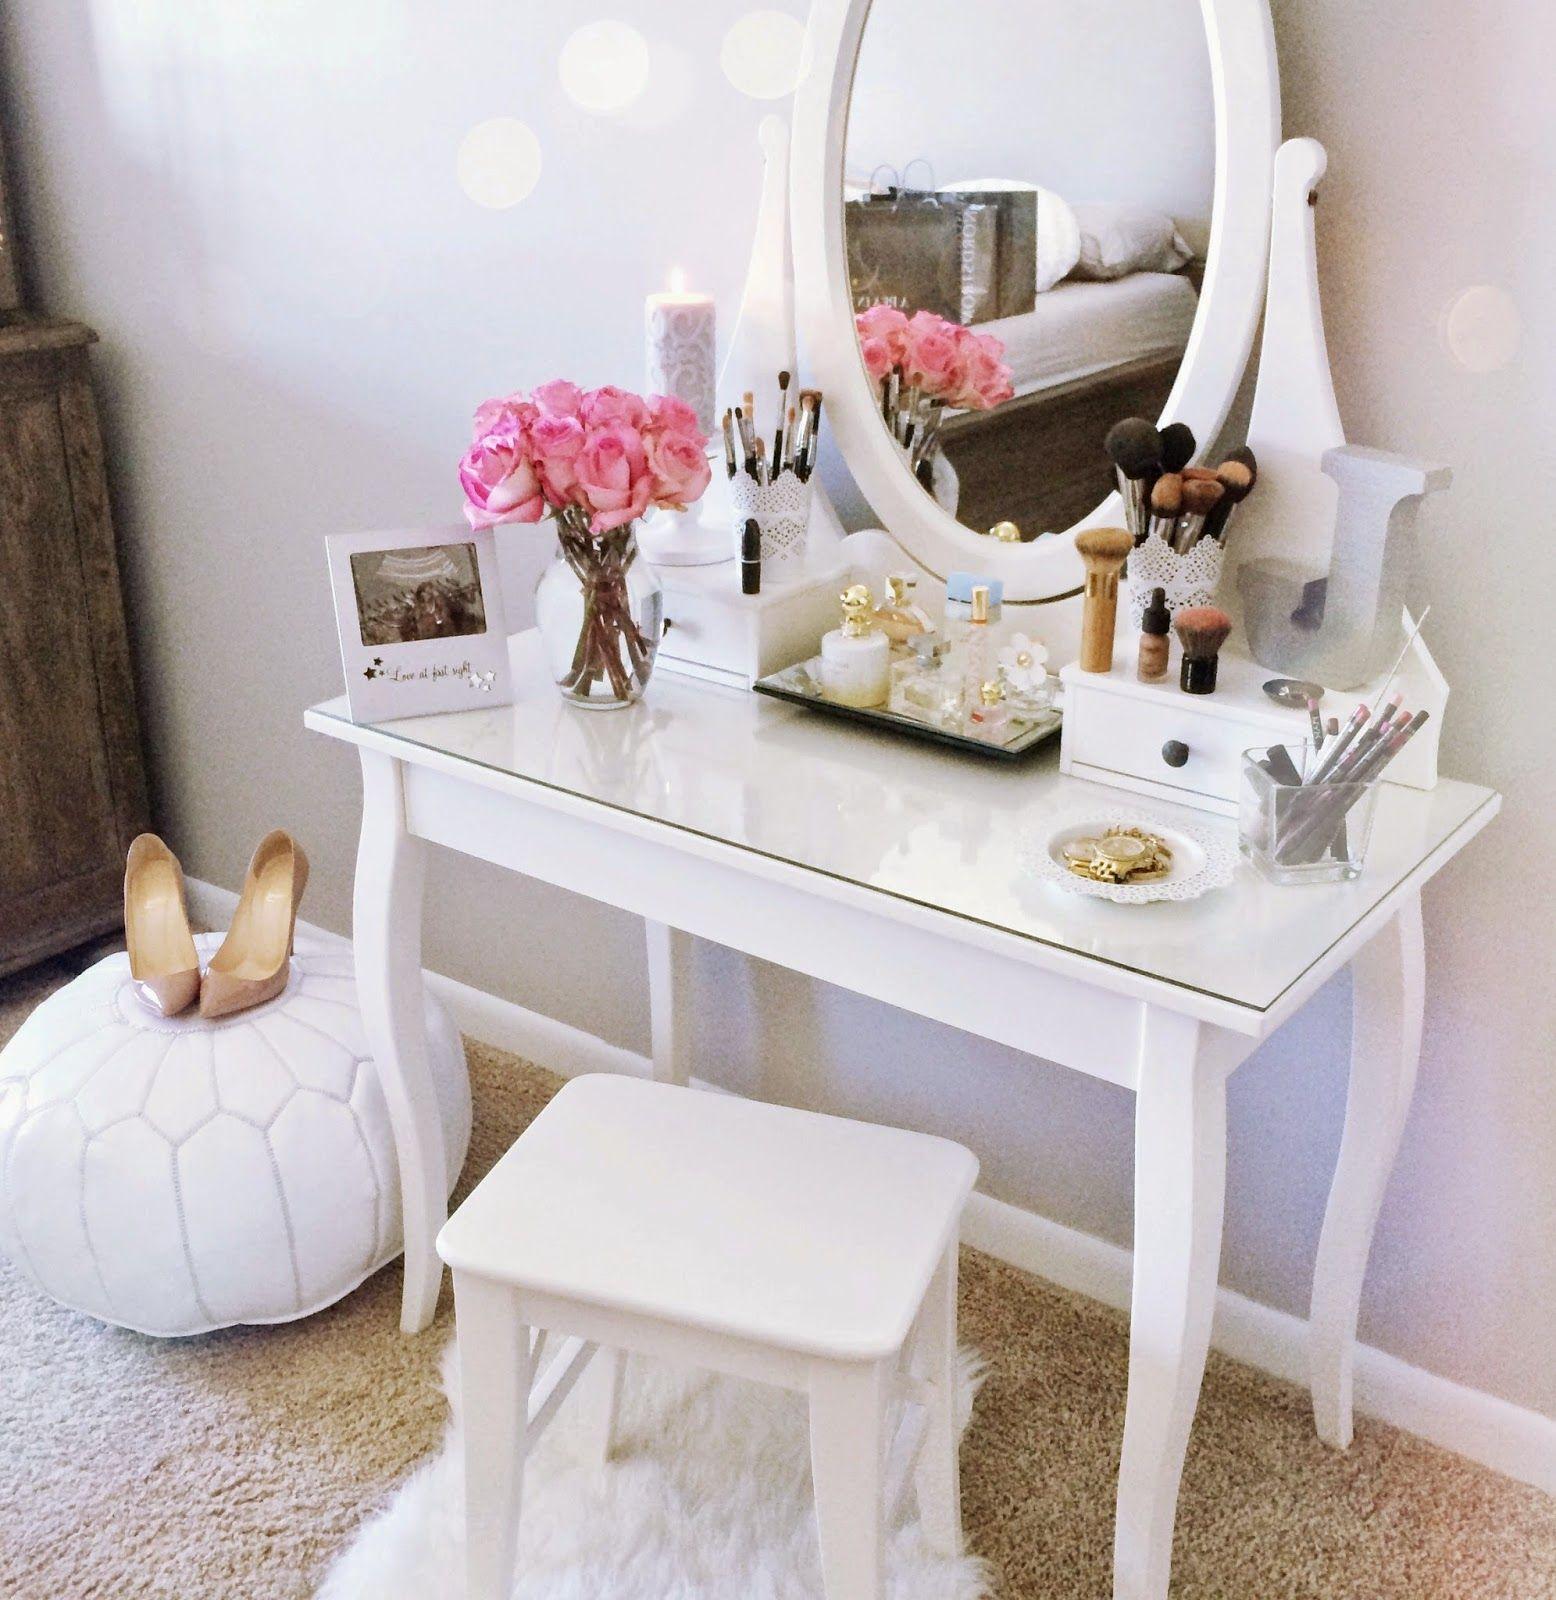 Best 25 Vanity Set Up Ideas On Pinterest Vanity Table With: Best 25+ Glass Vanity Table Ideas On Pinterest